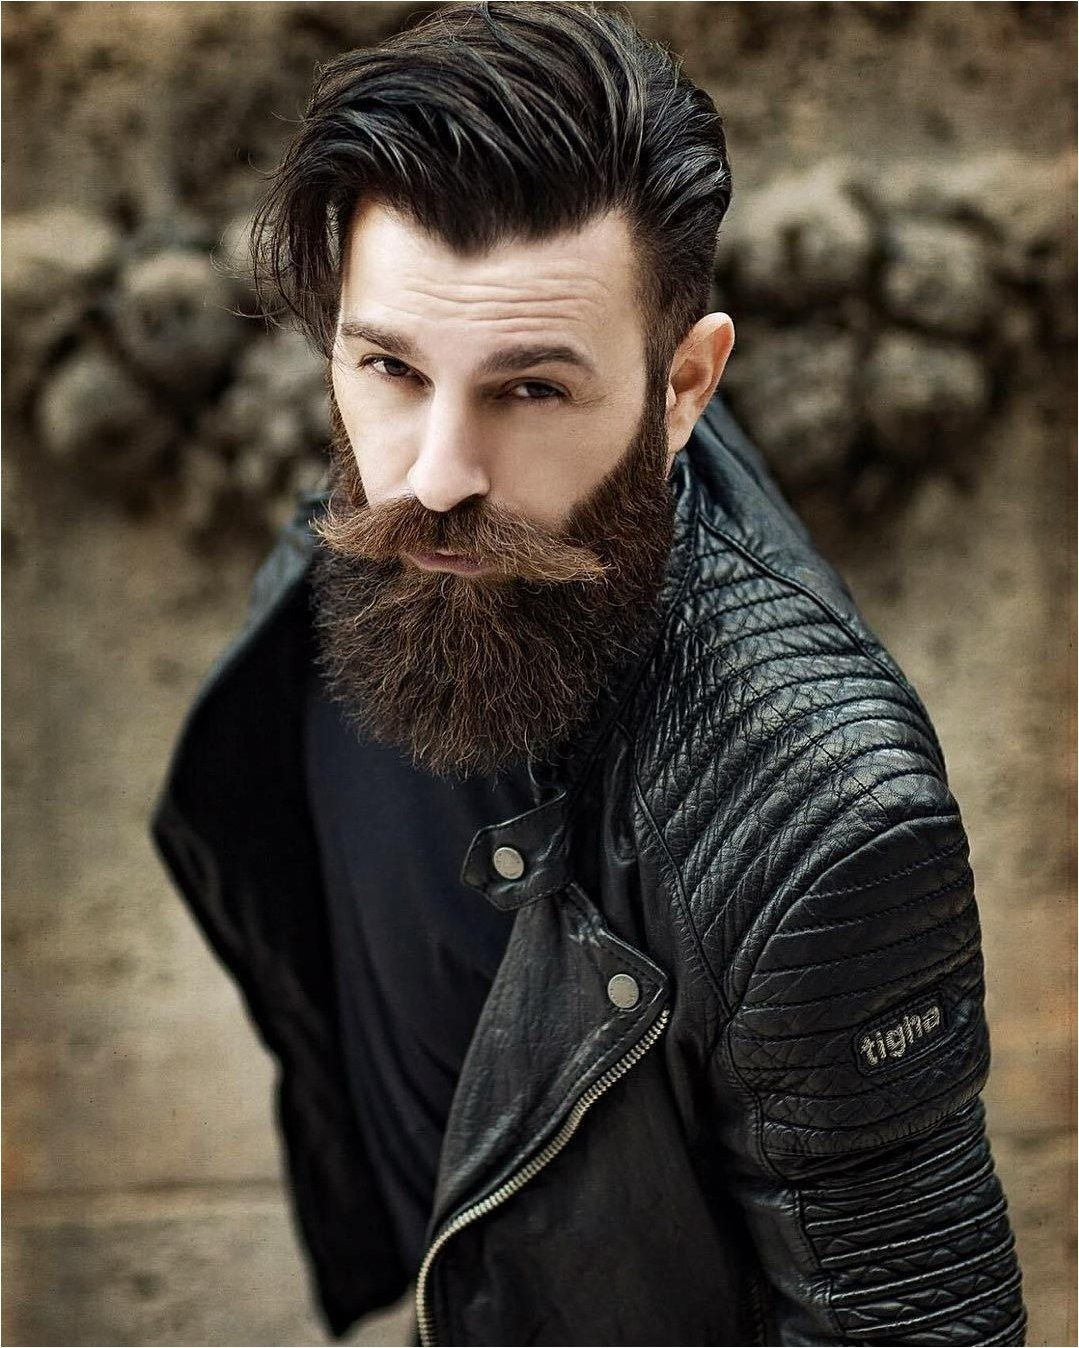 Haircut for men near me menus haircuts  hairstyles names for men barber hairstyles